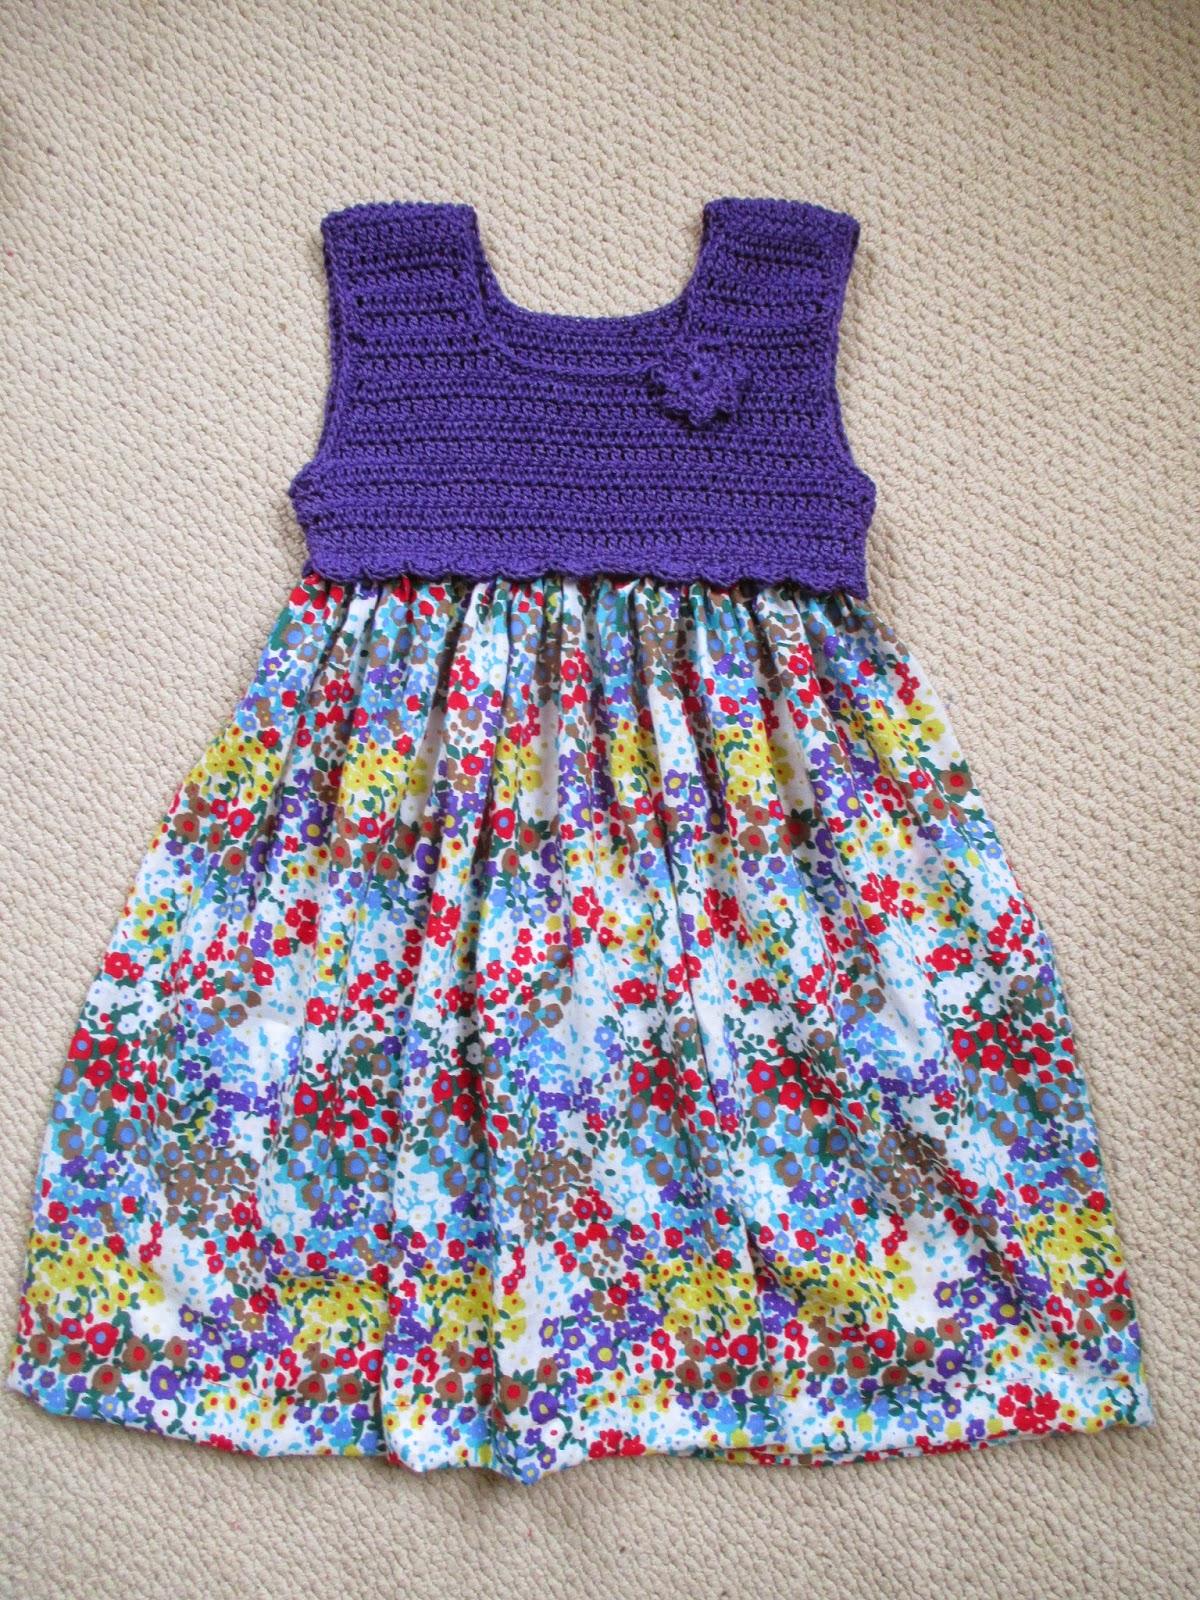 Three Stories High: FREE Crochet dress Tutorial